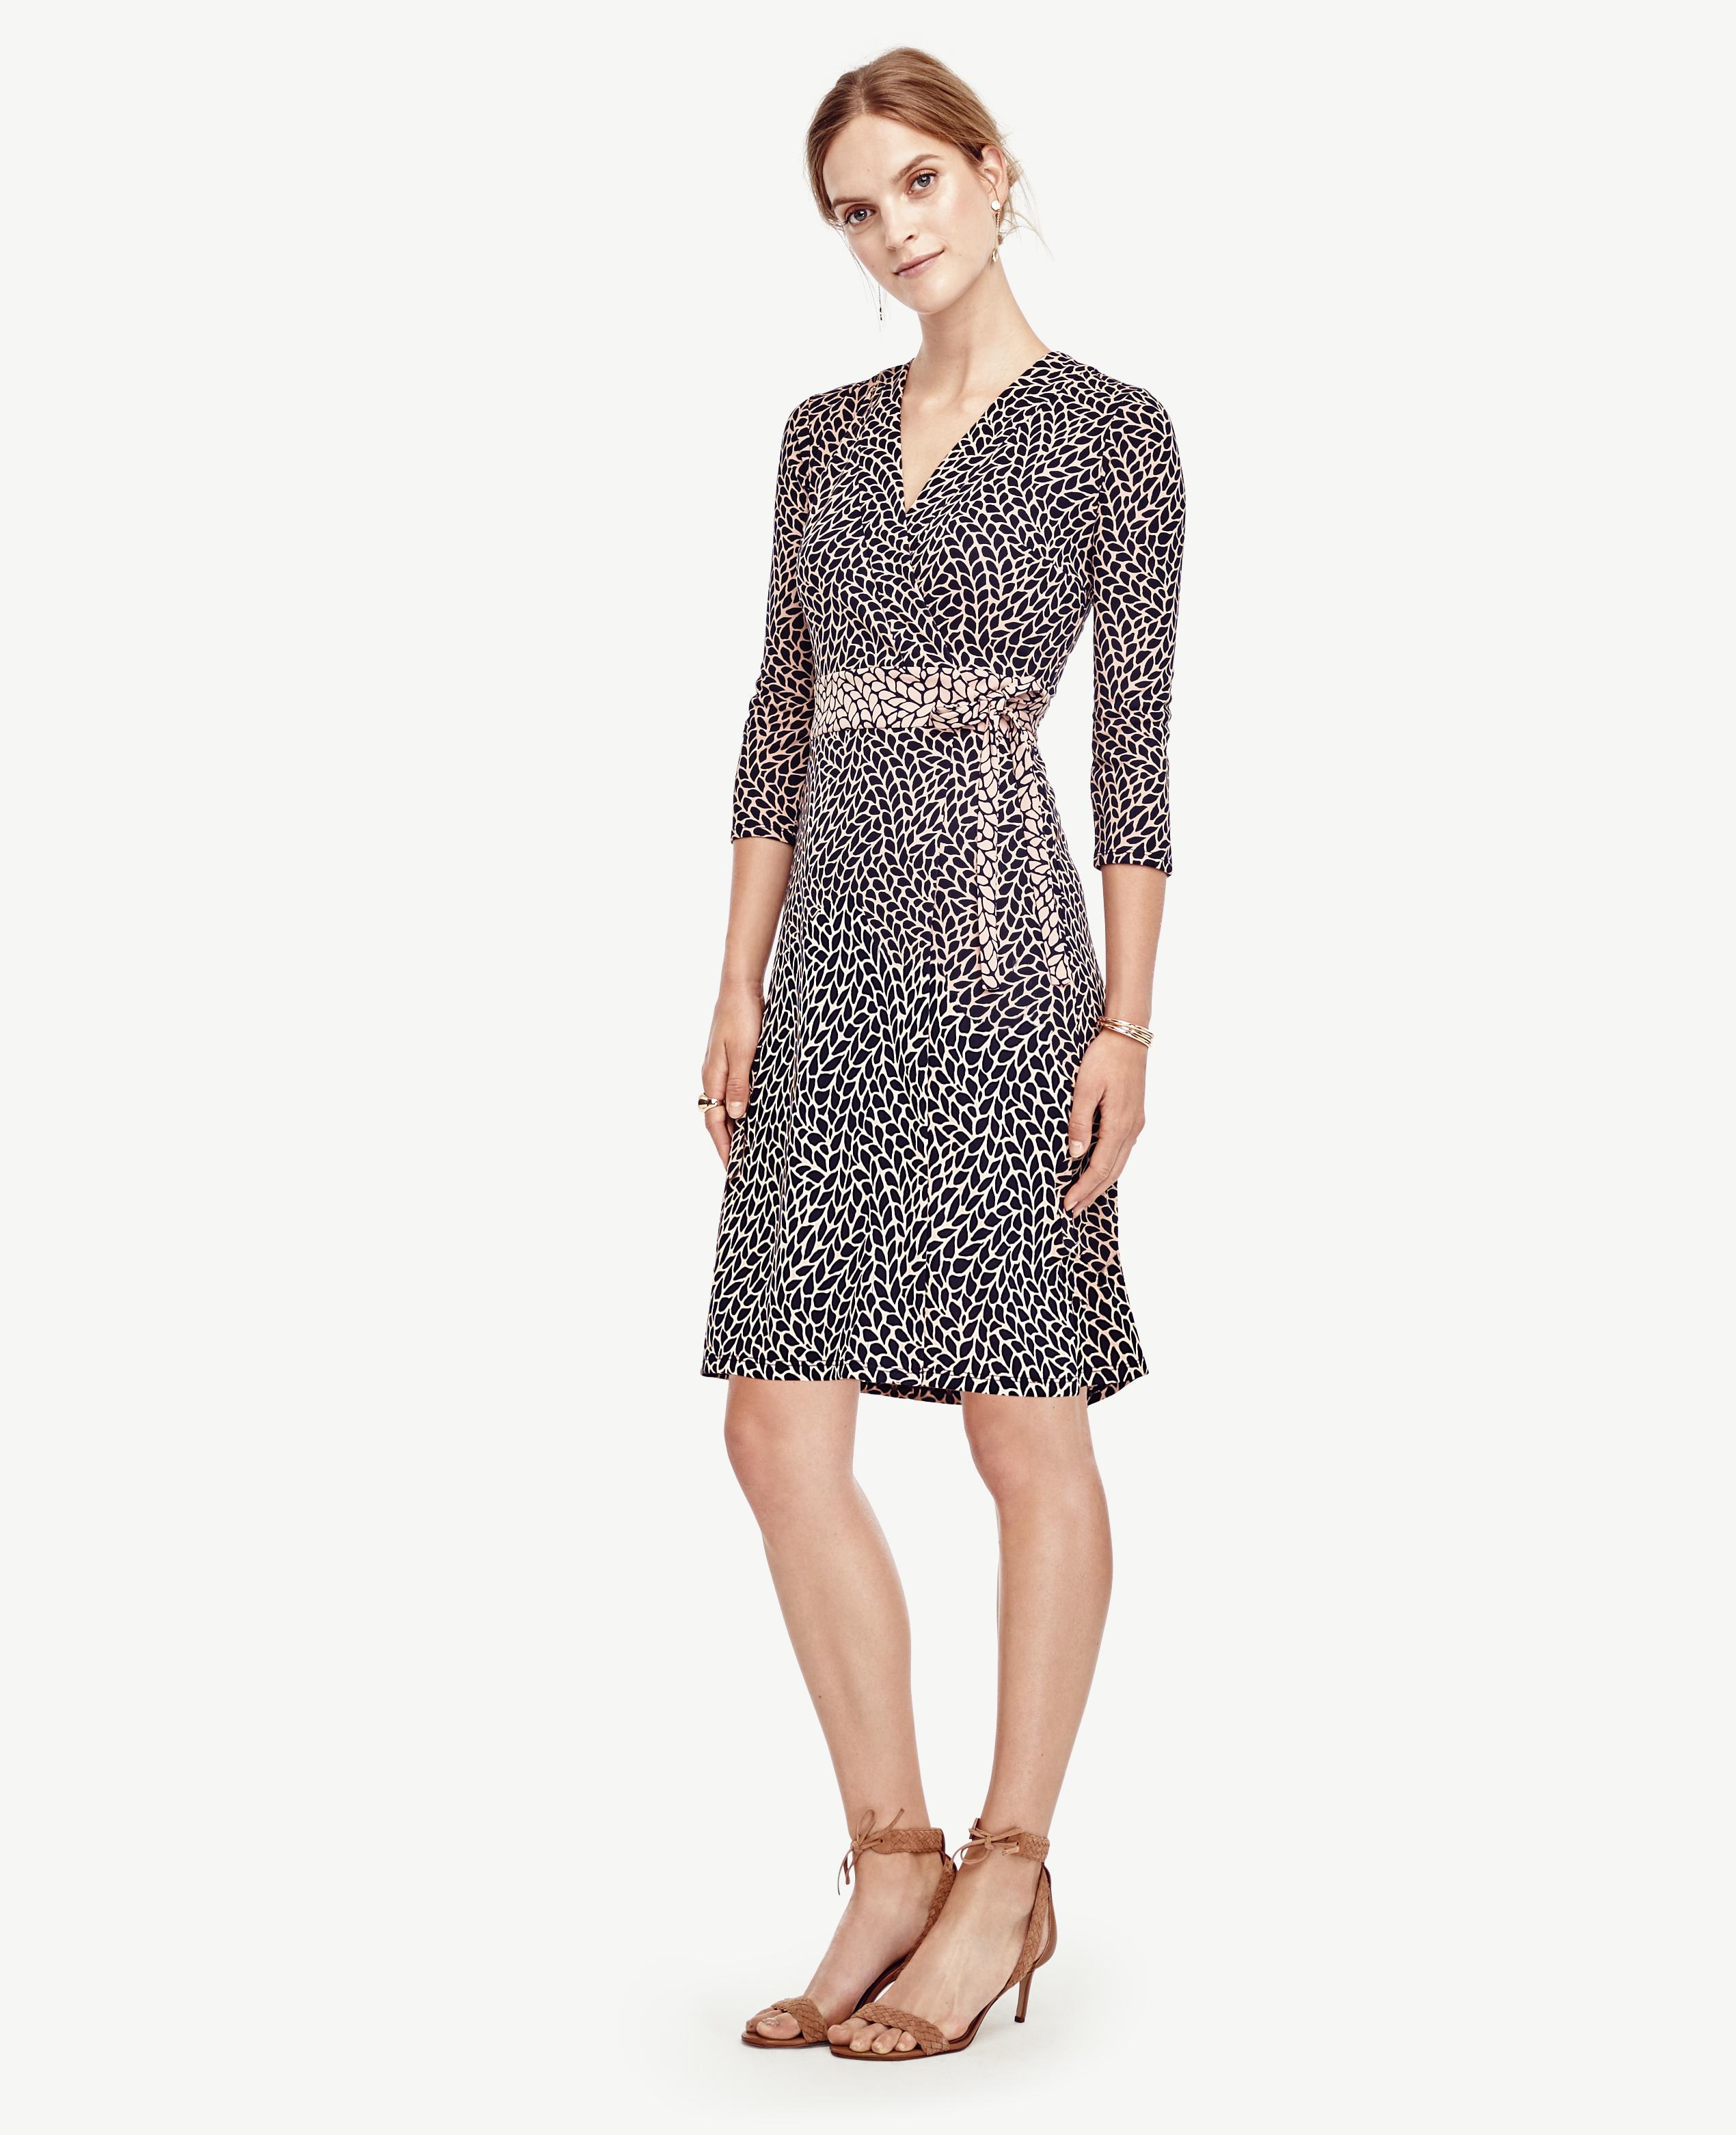 6f894b51447 Lyst - Ann Taylor Petite Leafy Wrap Dress in Gray